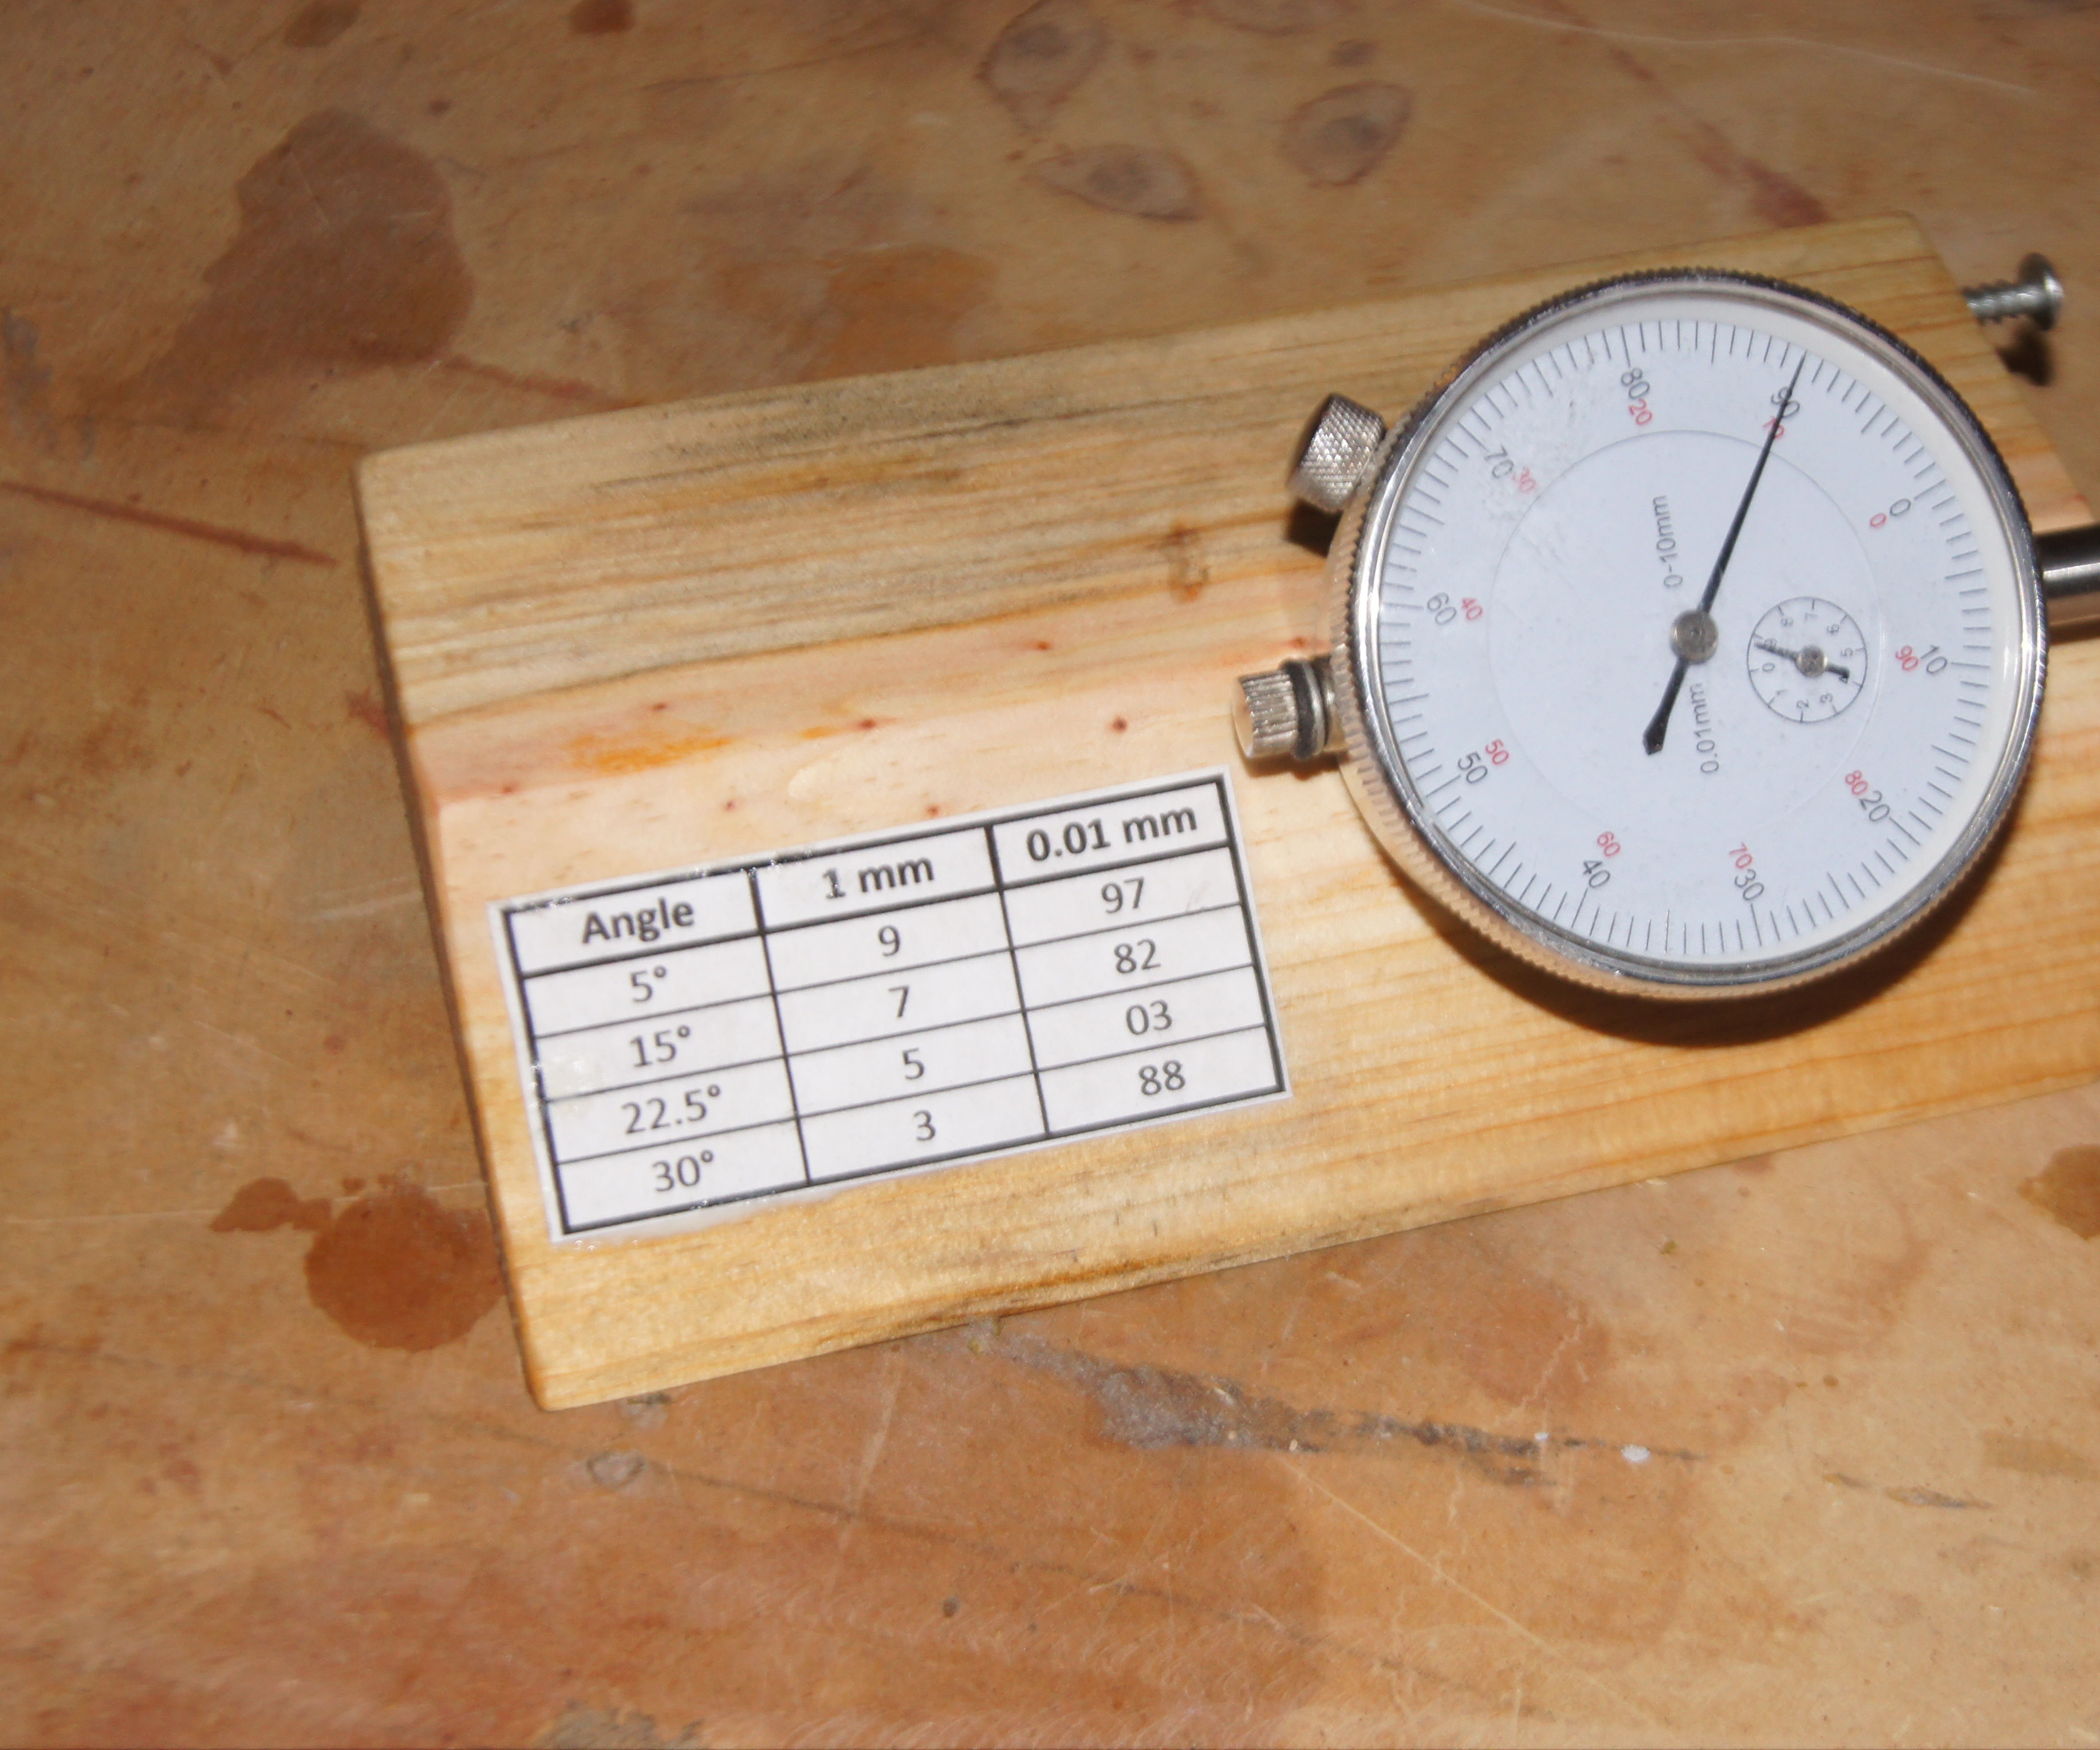 Angle Measuring Gadget